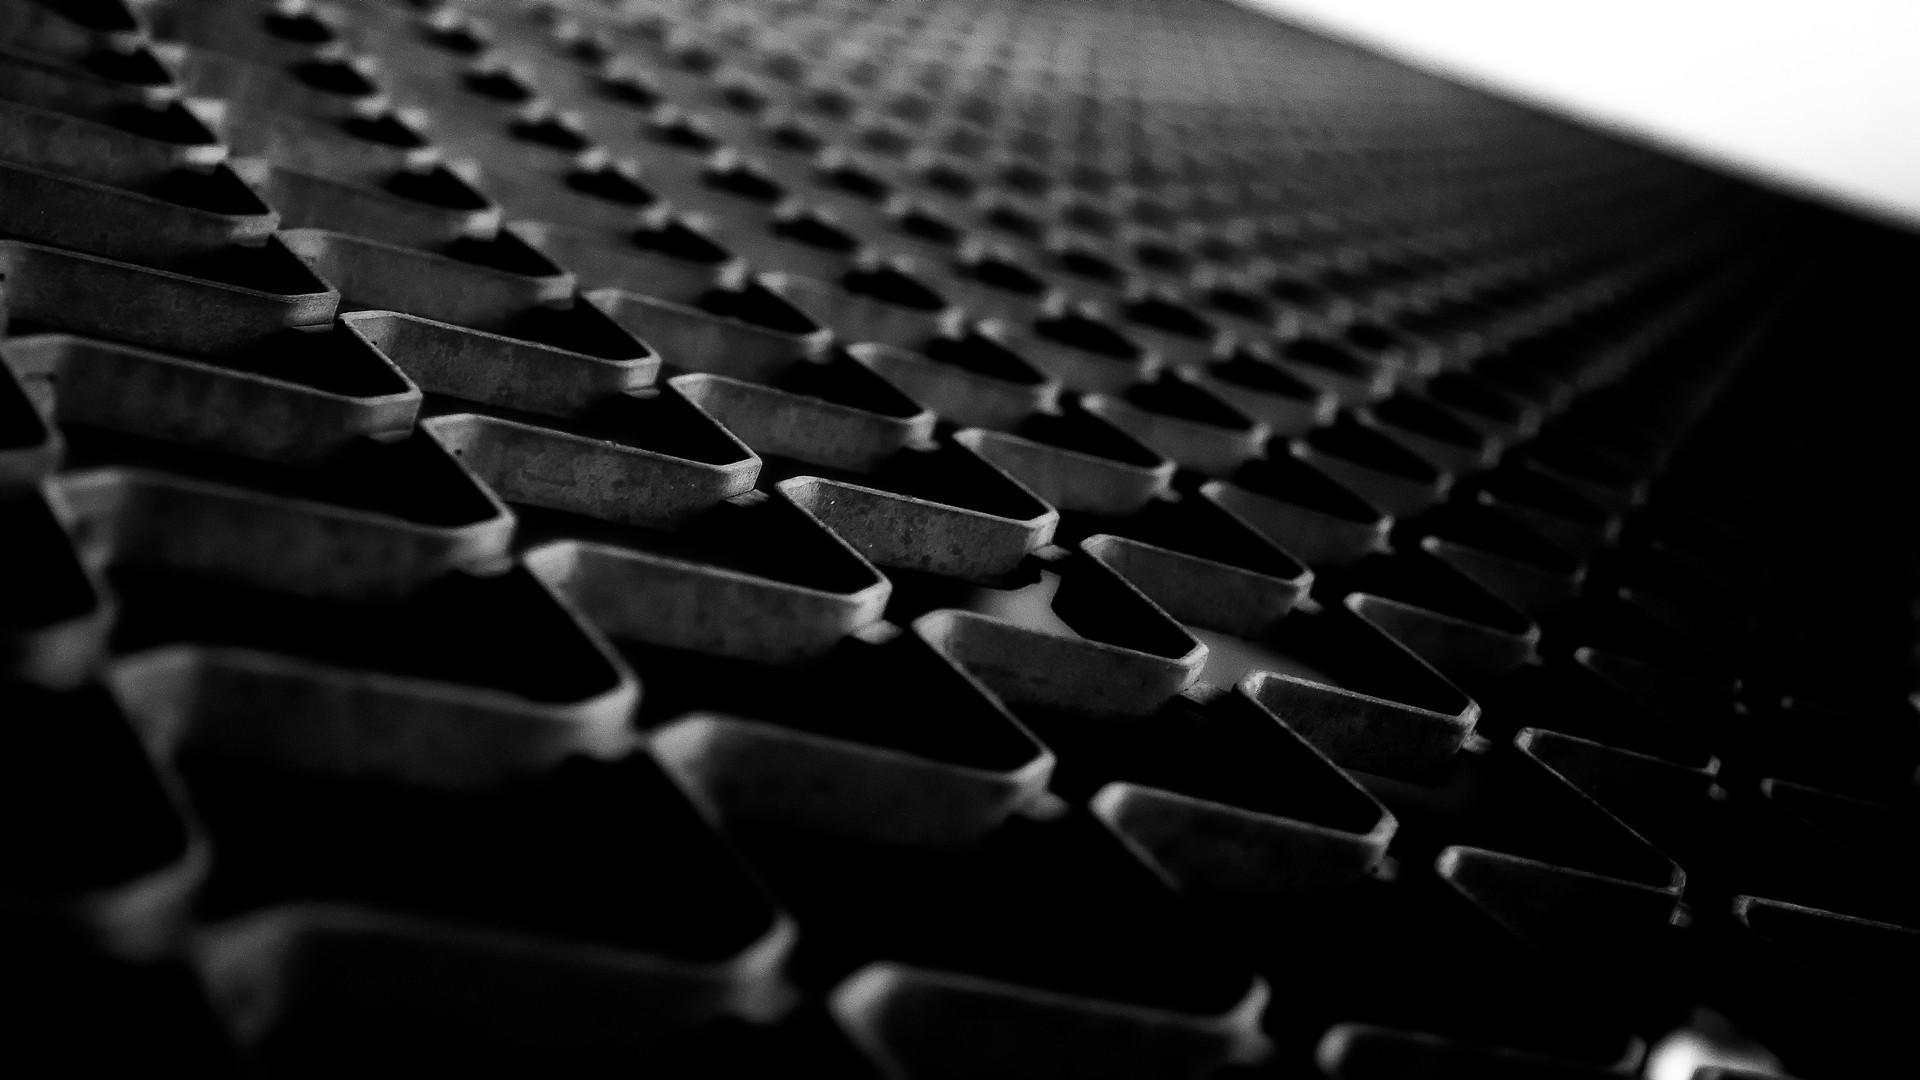 Metal-patterns-grid-grayscale-macro-gates-1920x1080-patterns-grid-grayscale-macro-gates-via-wallpaper-wp3808159